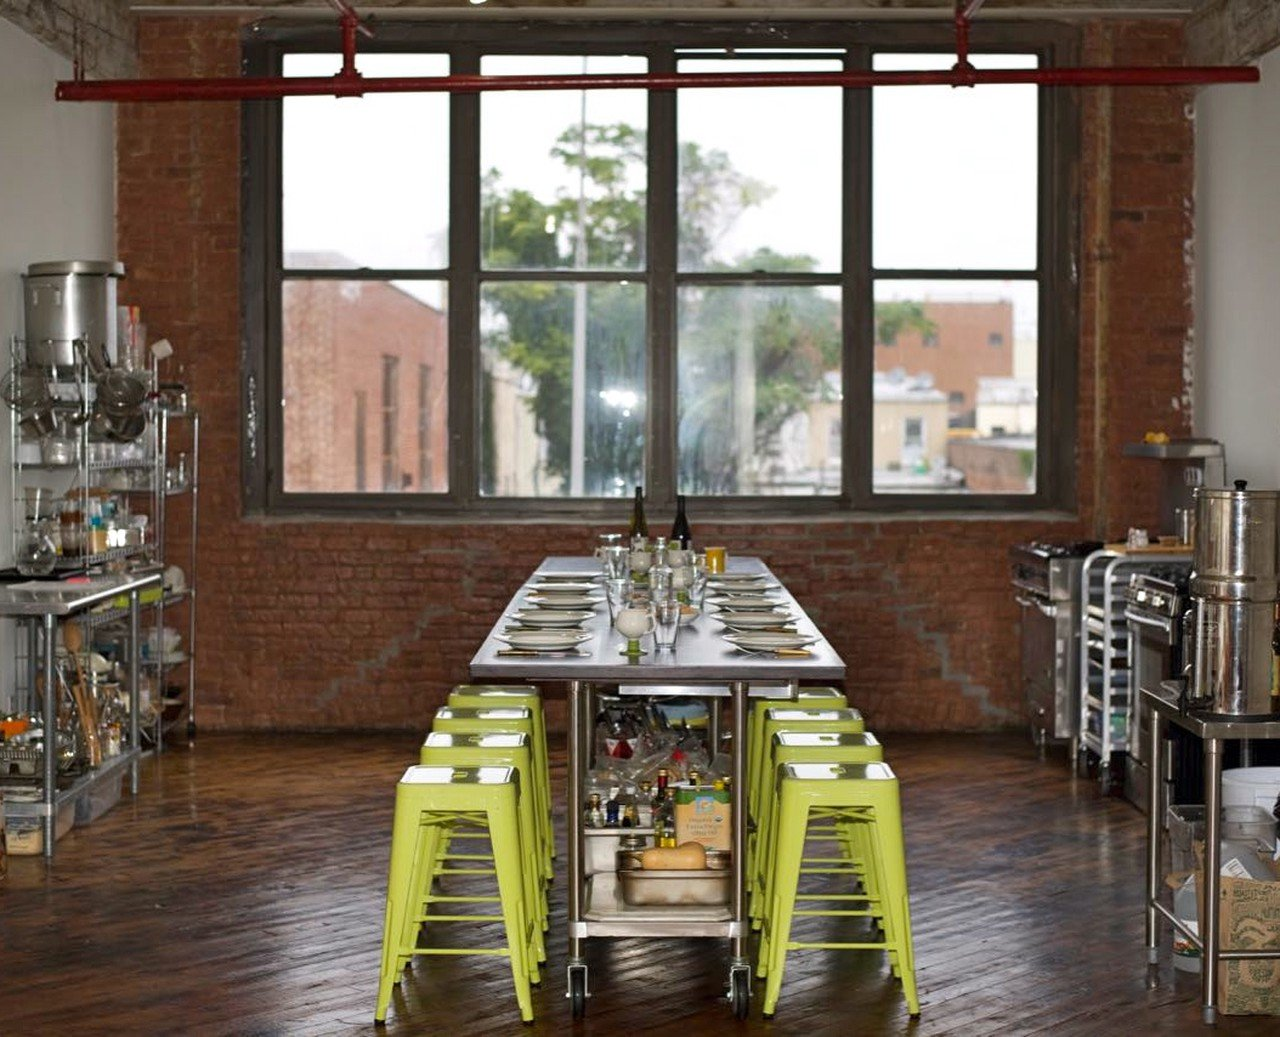 NYC workshop spaces Industriegebäude Brooklyn Culinary Studio image 0